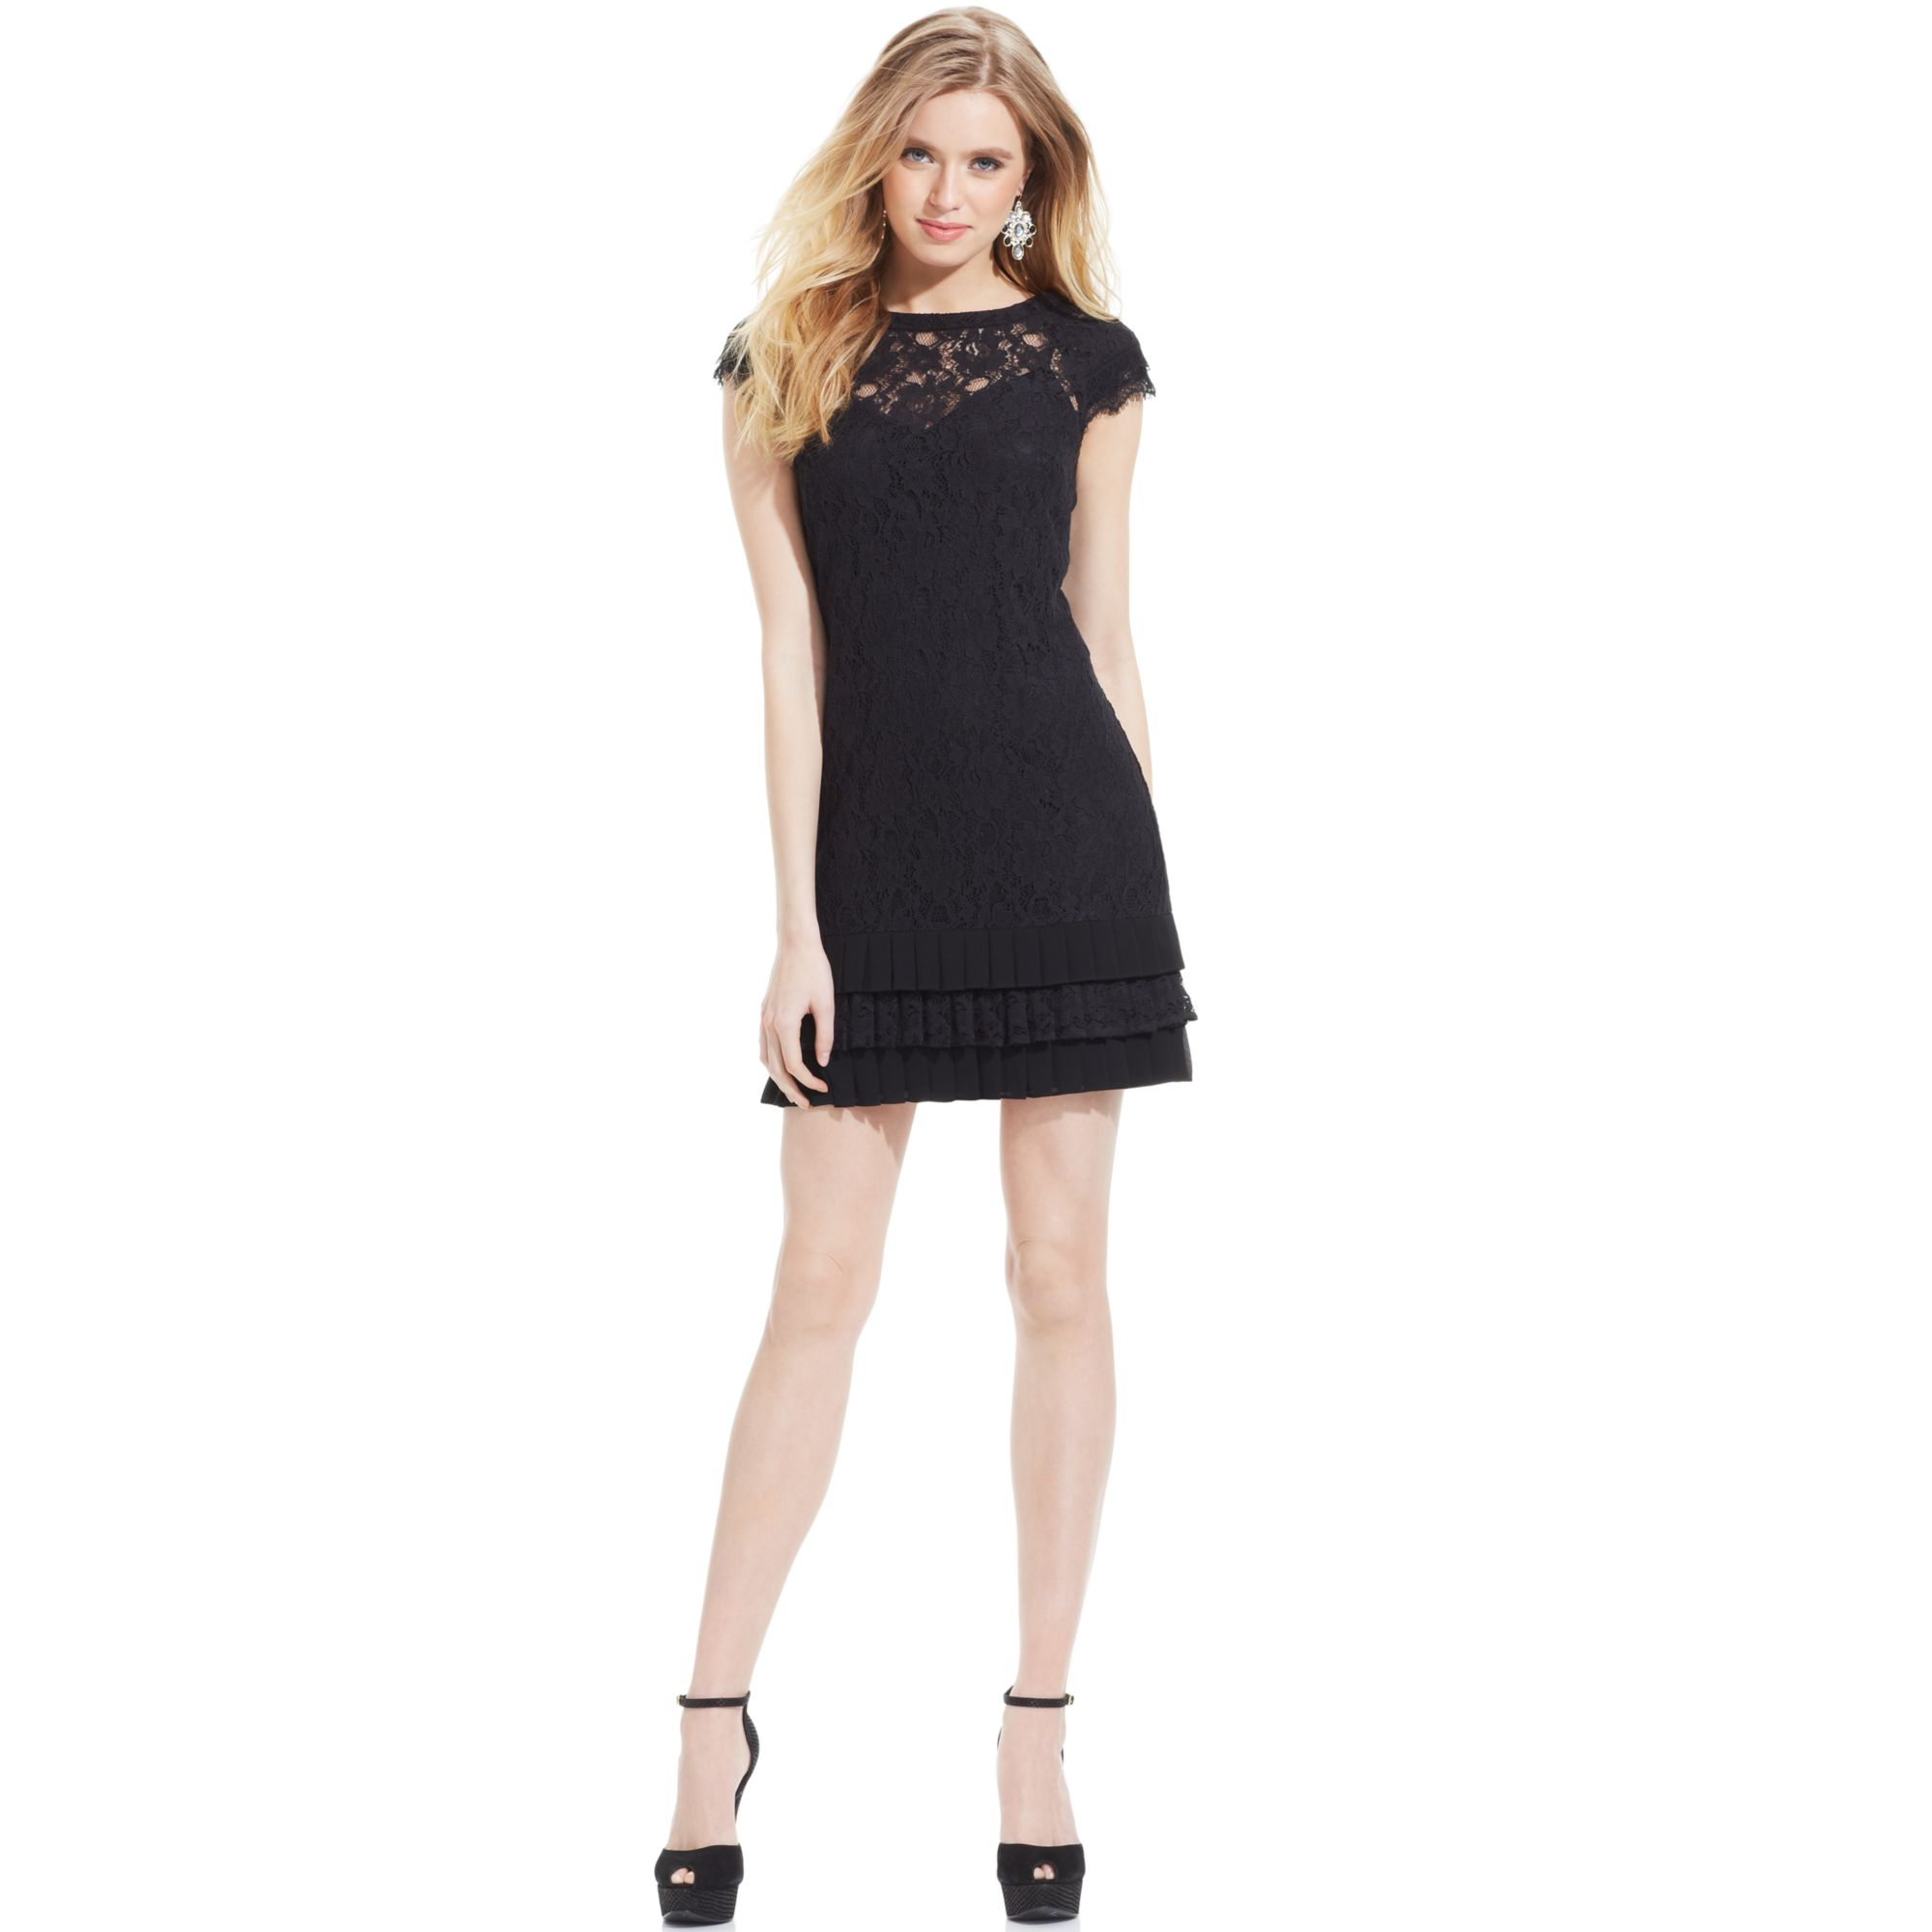 Turmec » black dress with lace cap sleeves